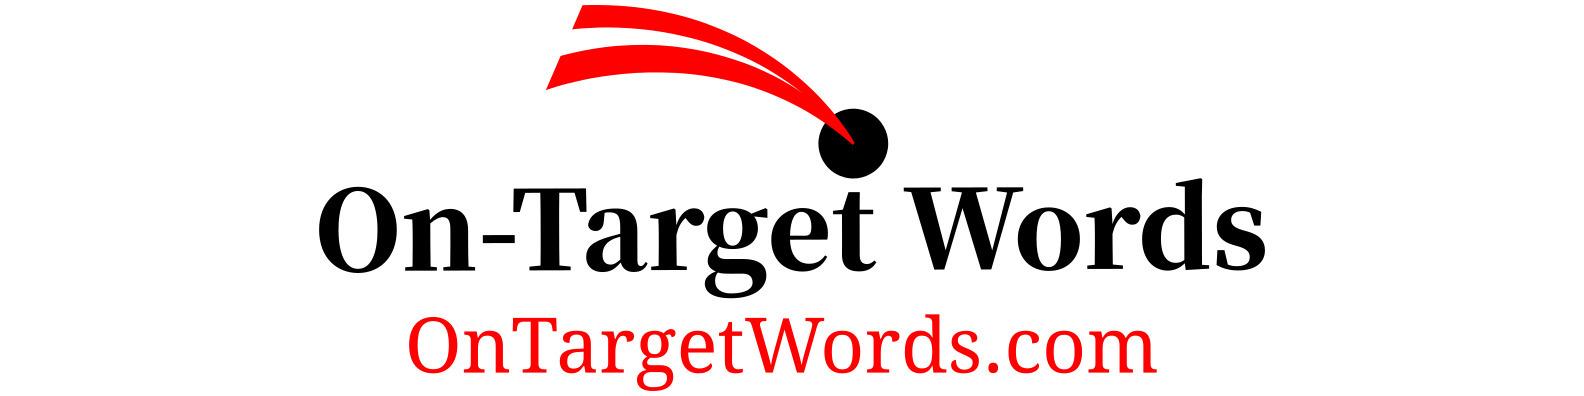 On-Target Words, LLC Logo